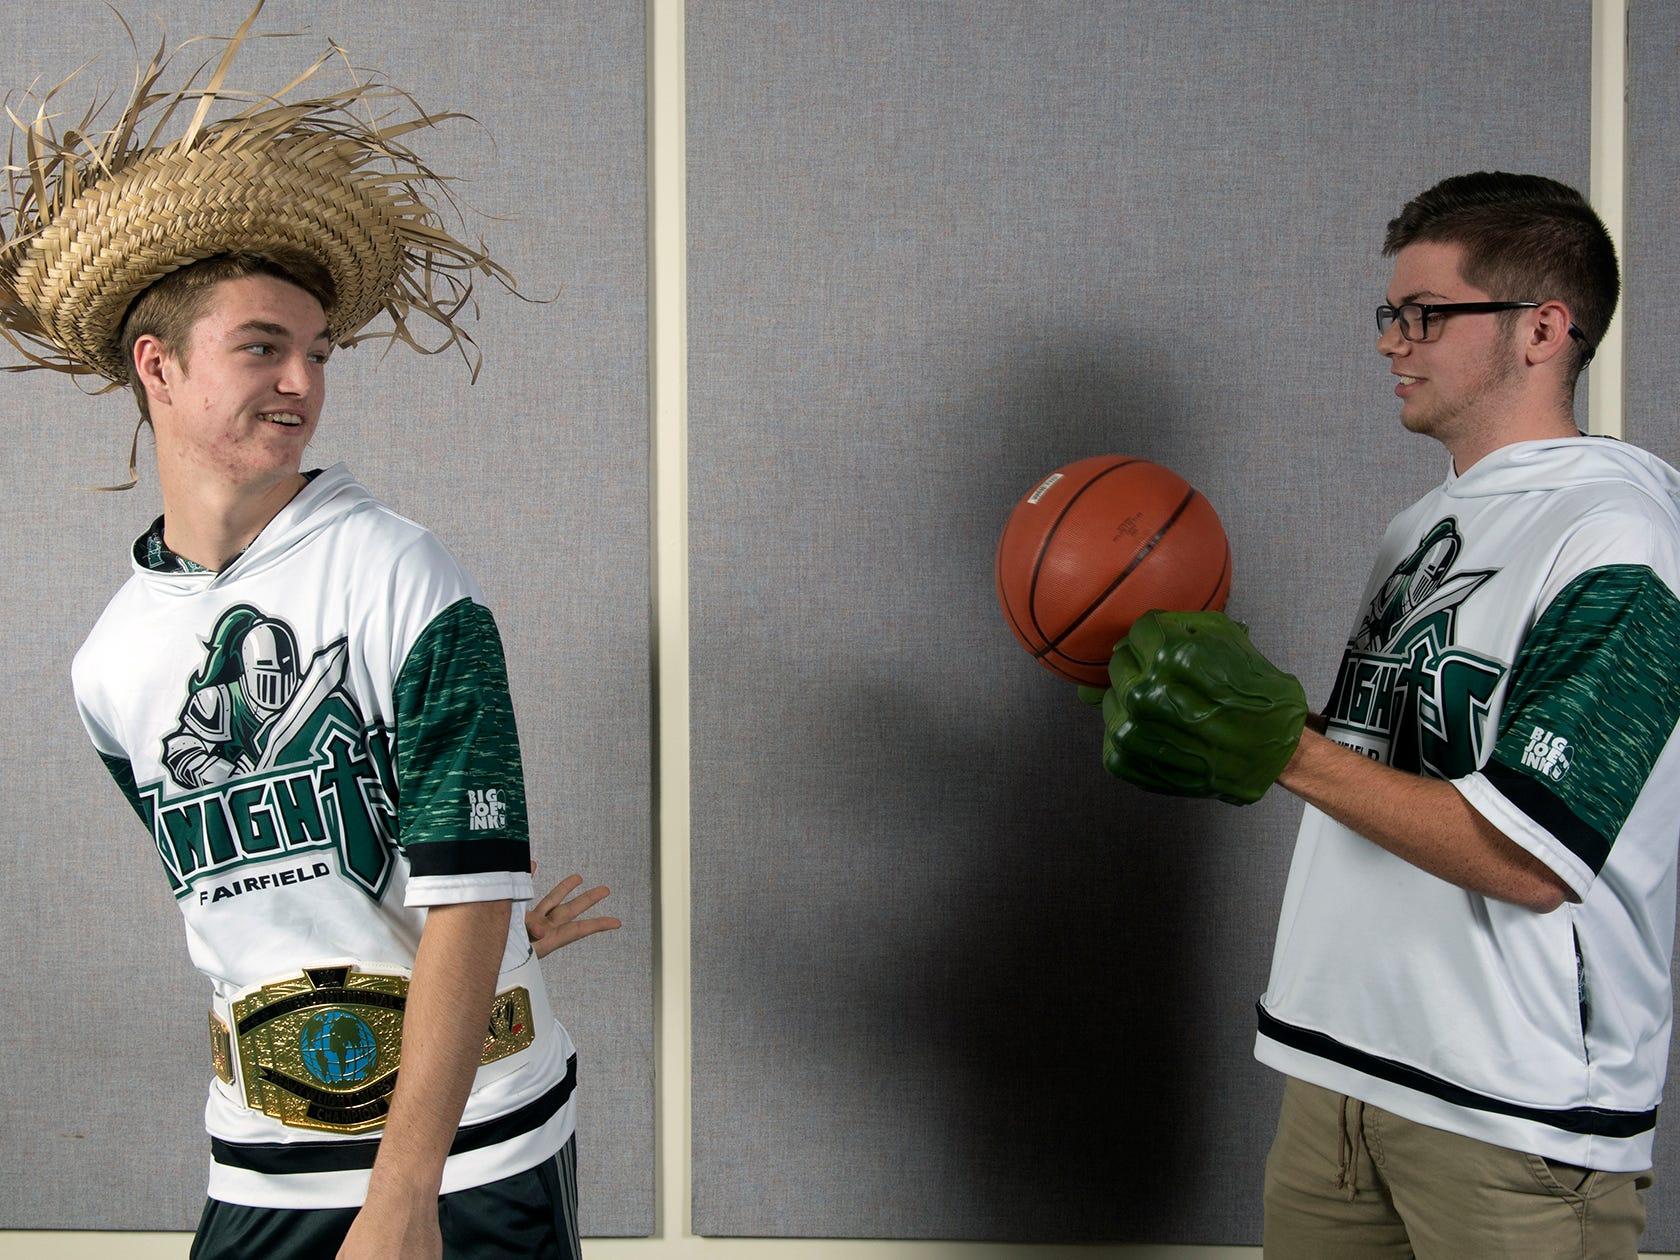 Joey Quealy, left, and Josh Kollars, with the Fairfield High School boys basketball team, pose during the 2018-19 GameTimePa YAIAA Winter Media Day Sunday November 11, 2018.